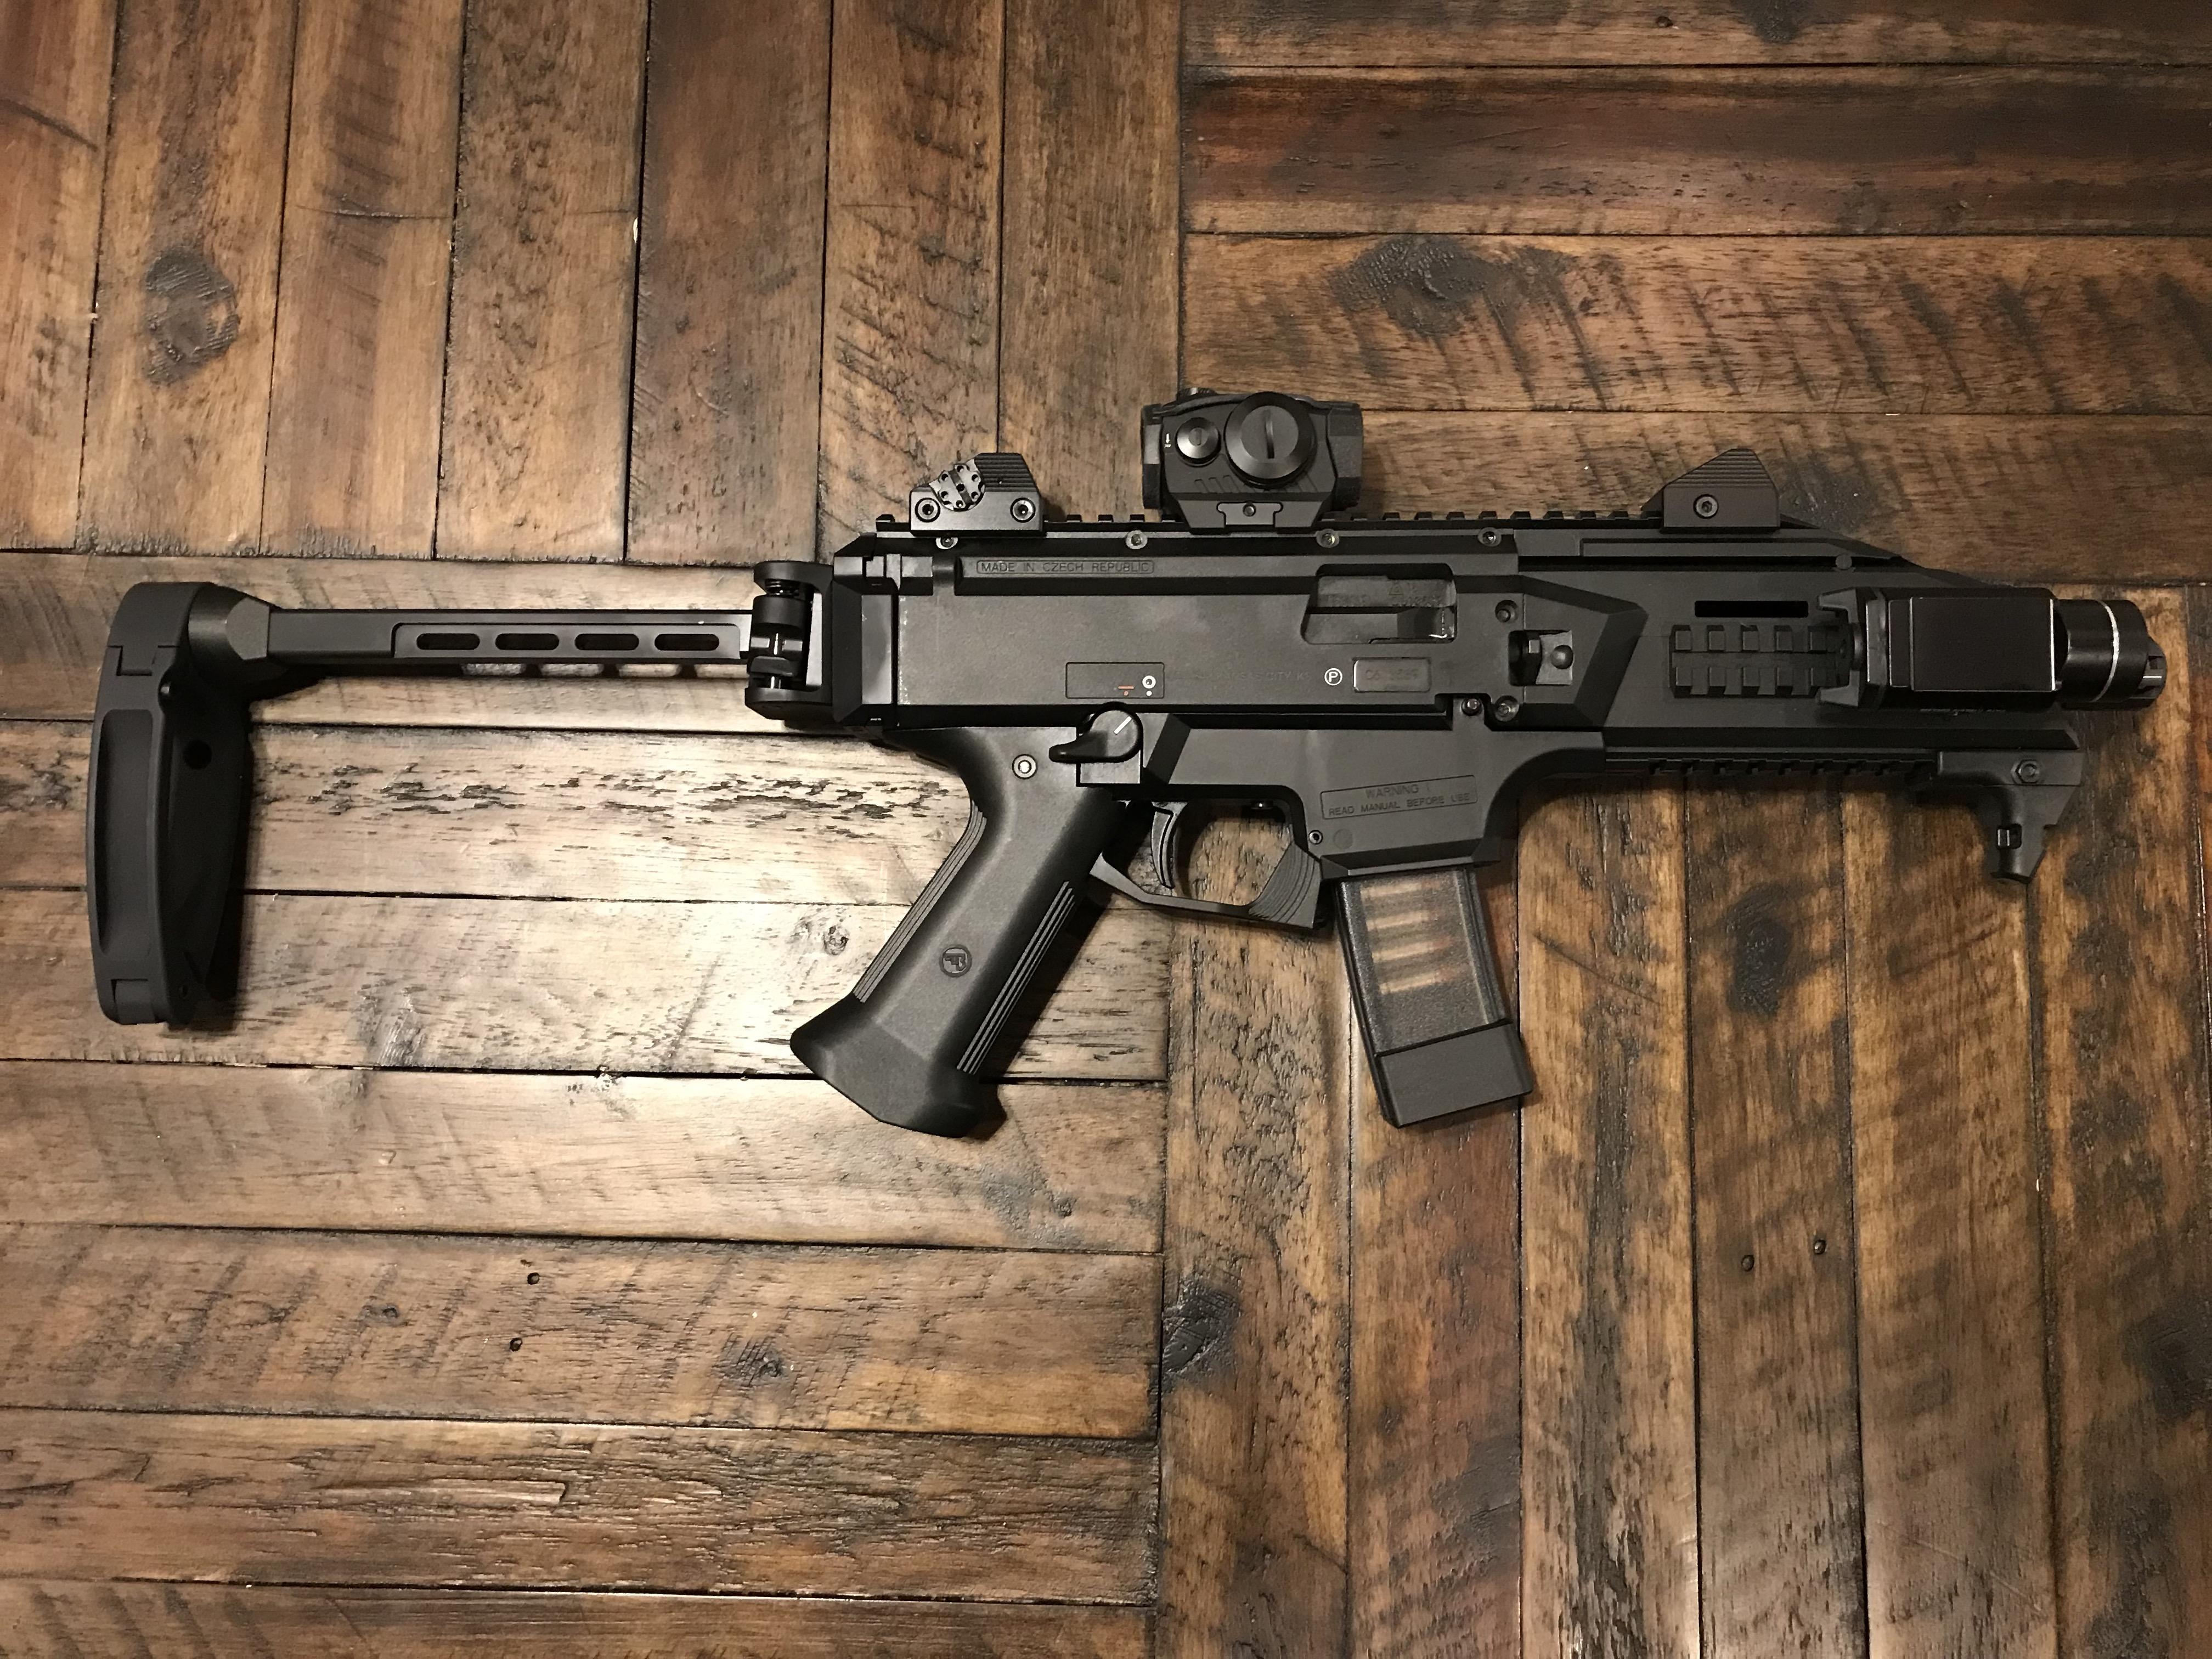 My new CZ Scorpion EVO pistol